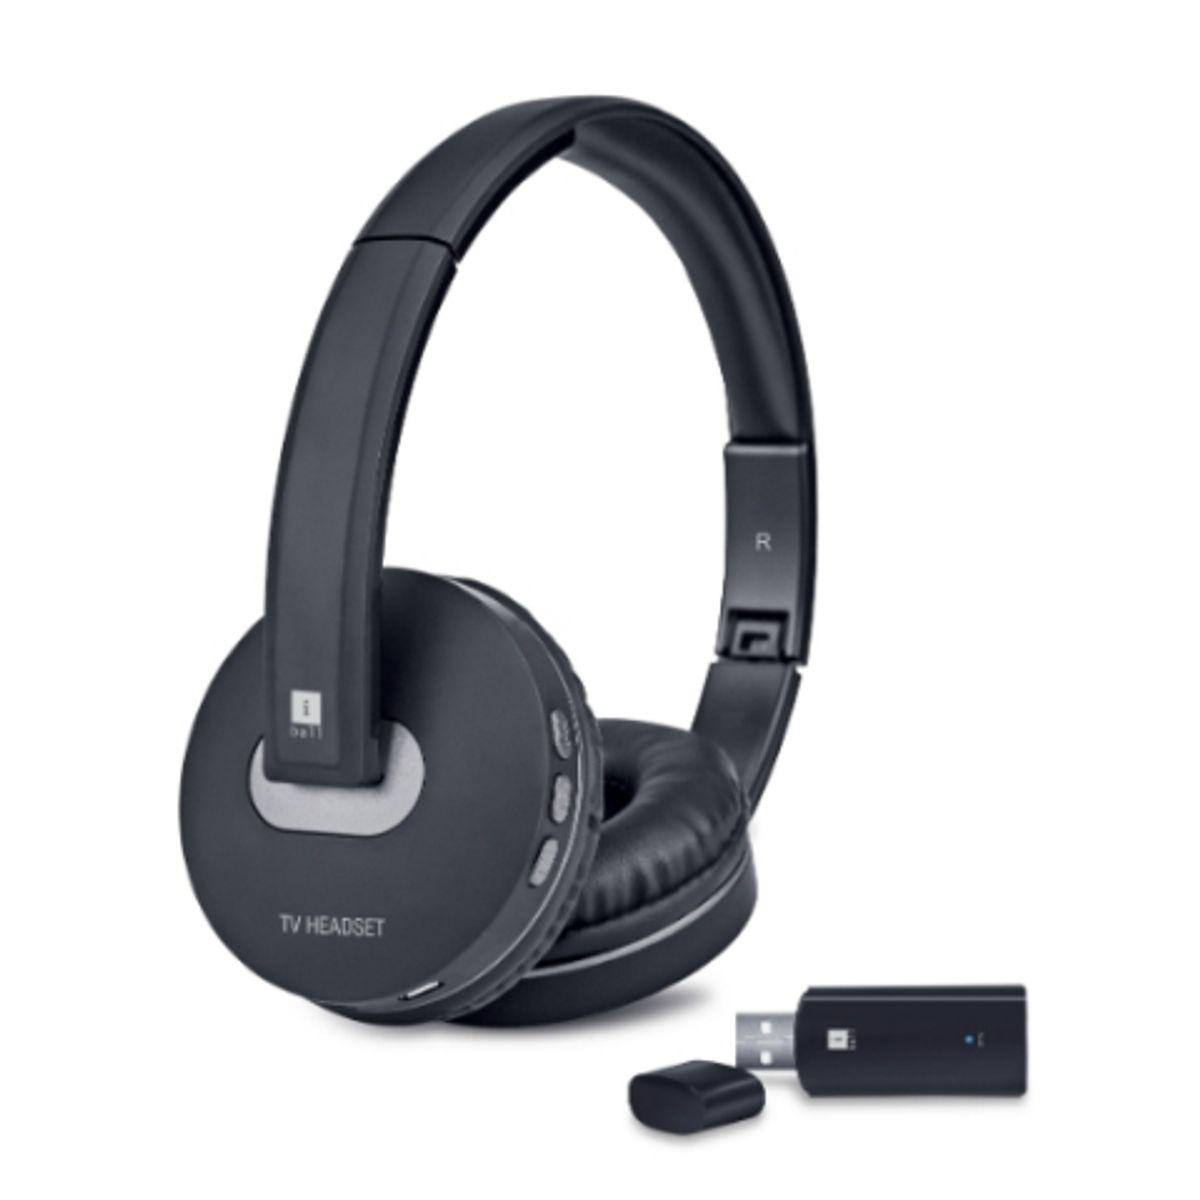 iBall Wireless TV Headset with Bluetooth USB audio